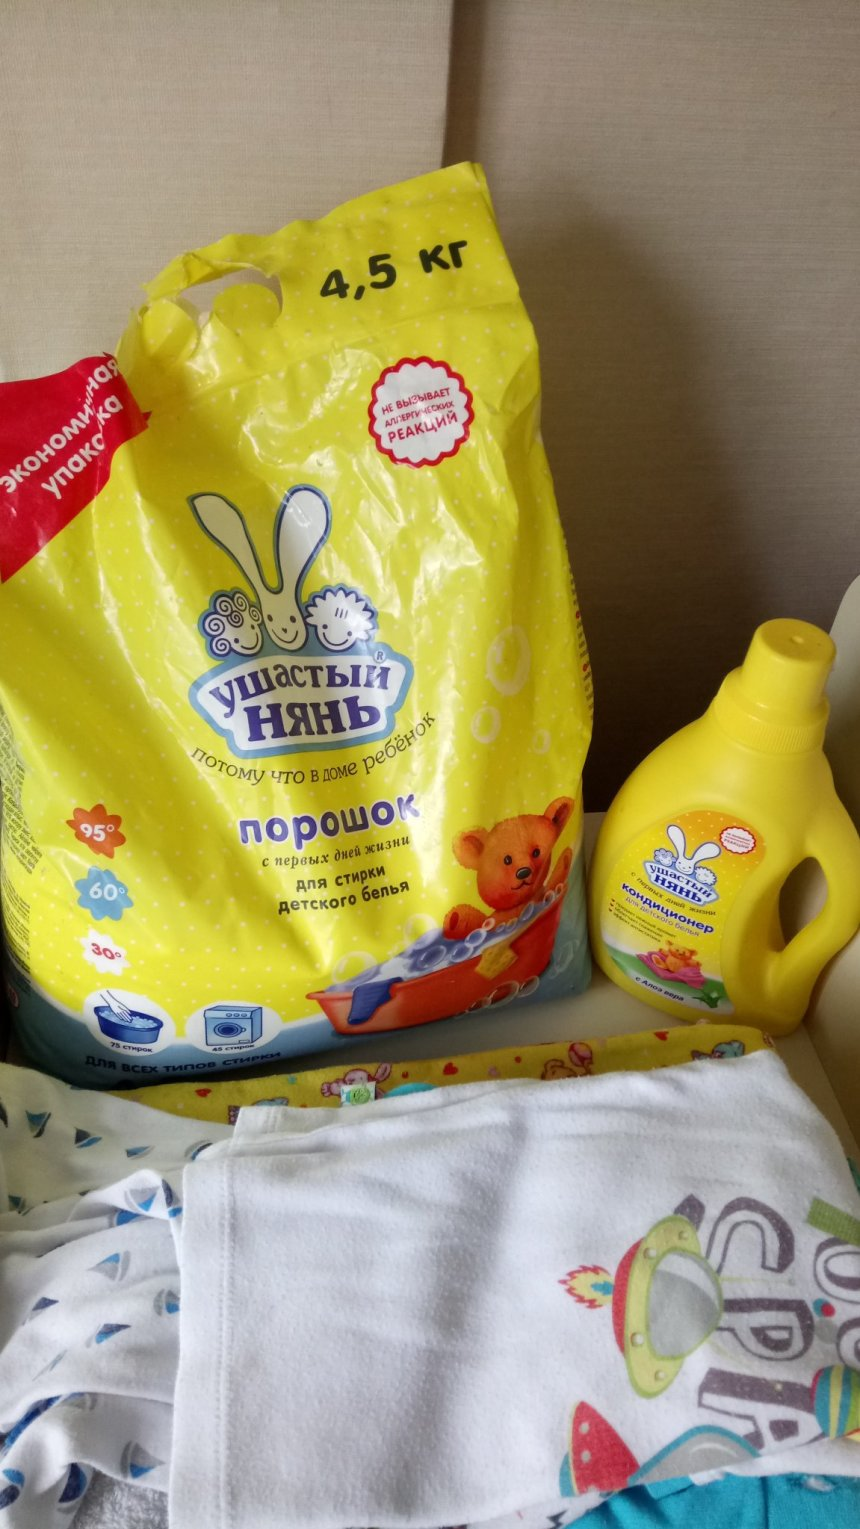 Отчёт по занятию Уход за детским бельем в Wachanga!